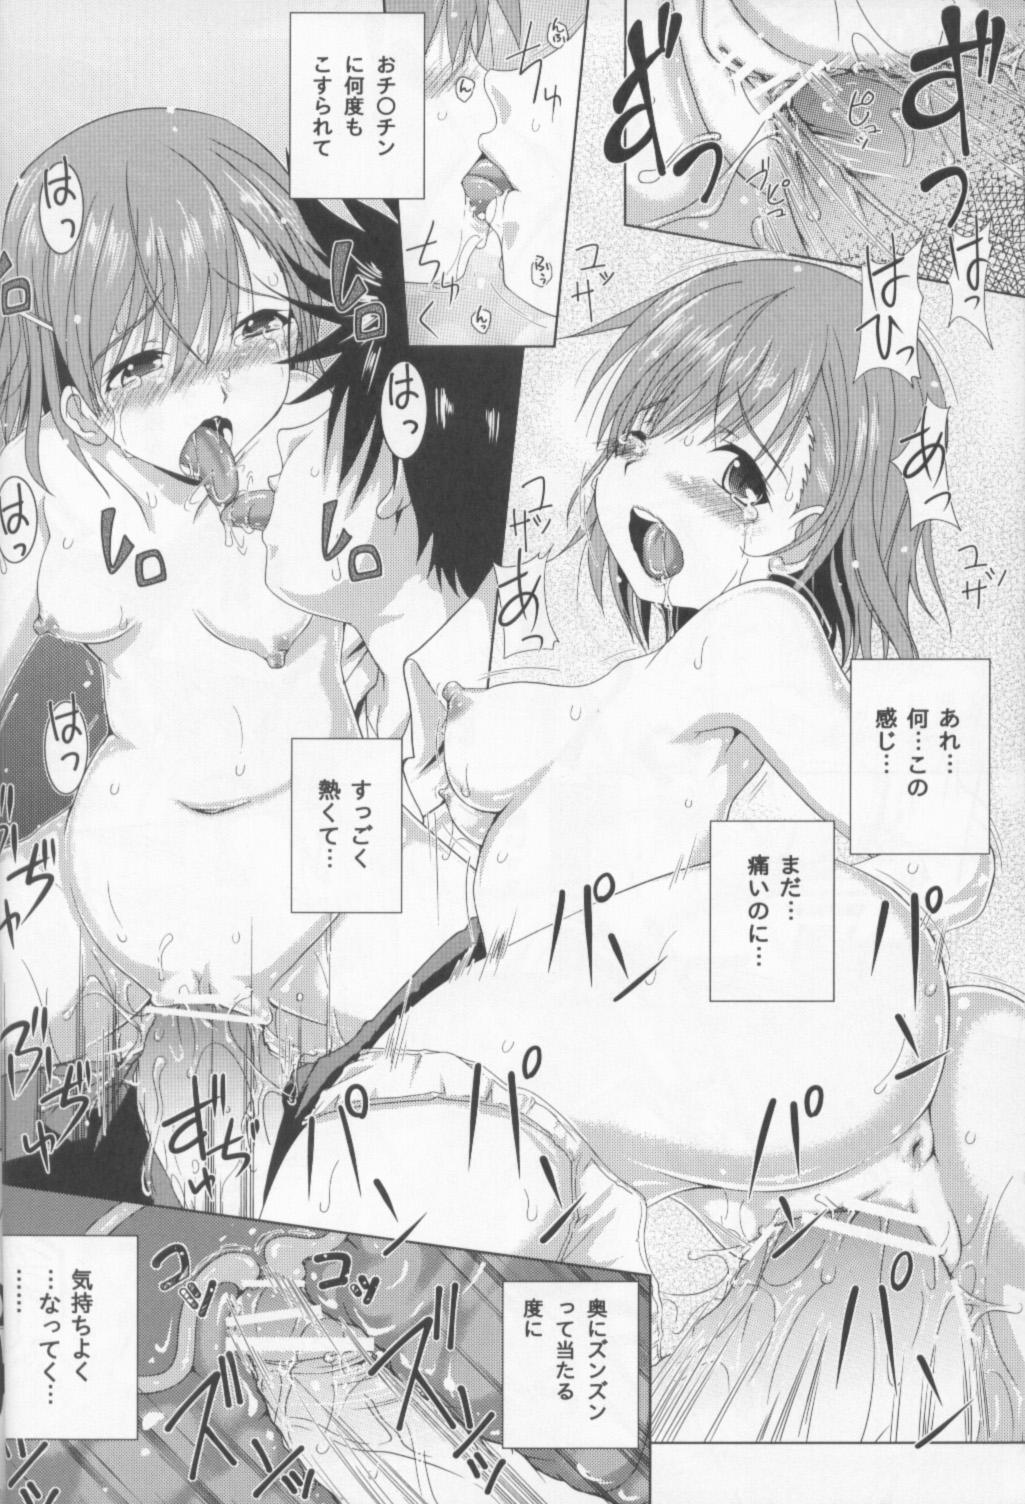 Toaru Yumemiru Level 5 14